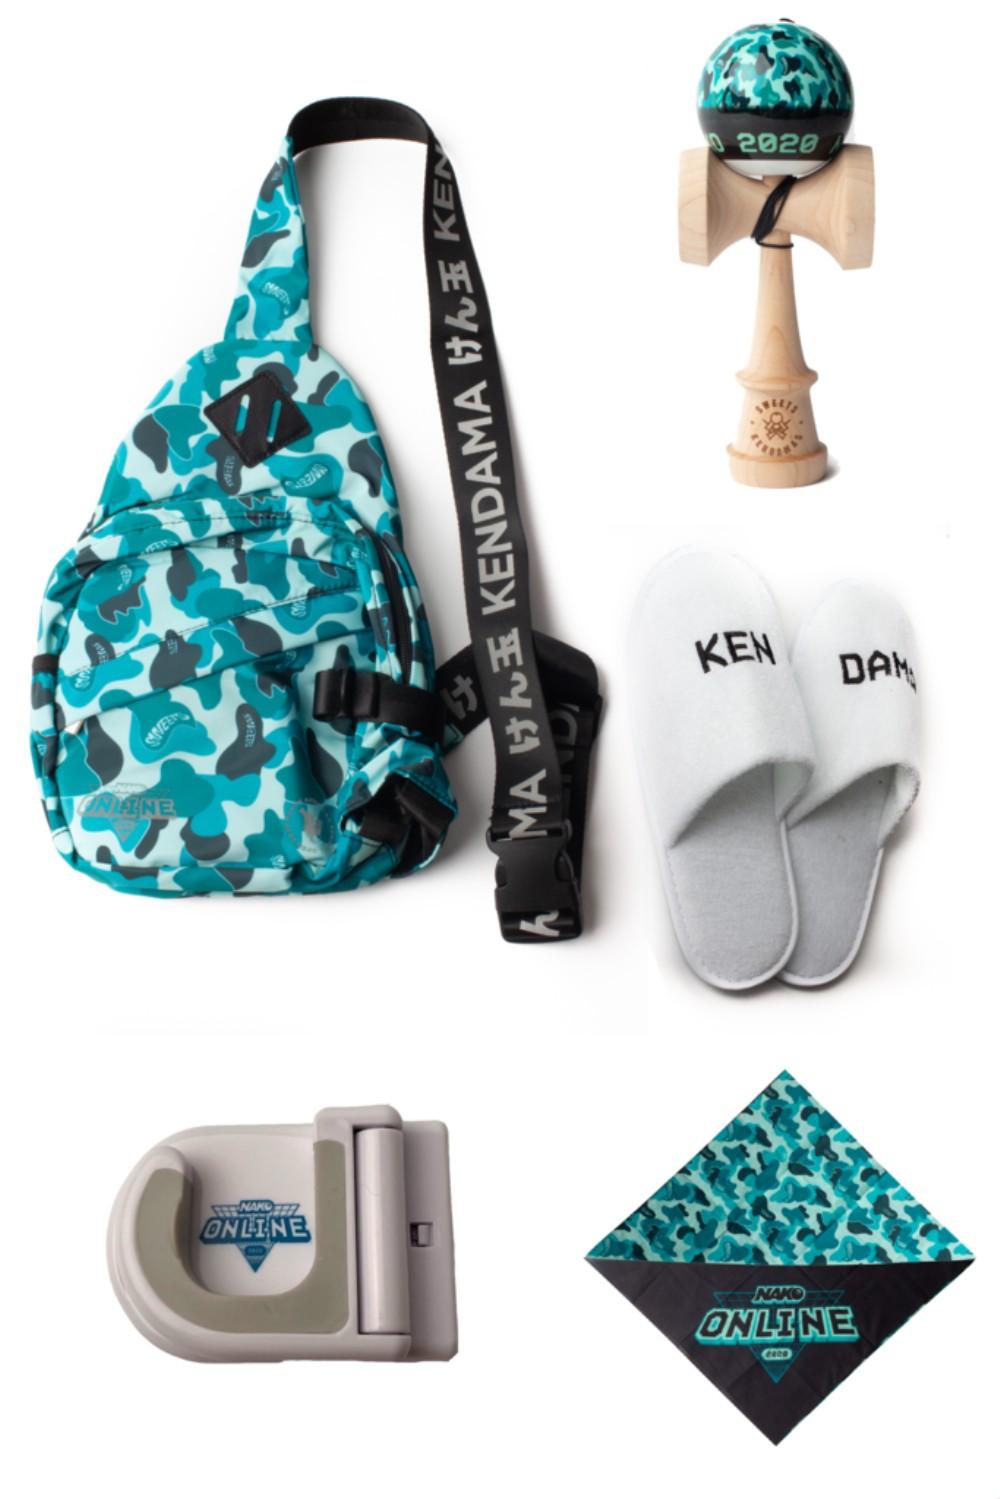 Sweets Kendamas - NAKO 2020 Swag Bag